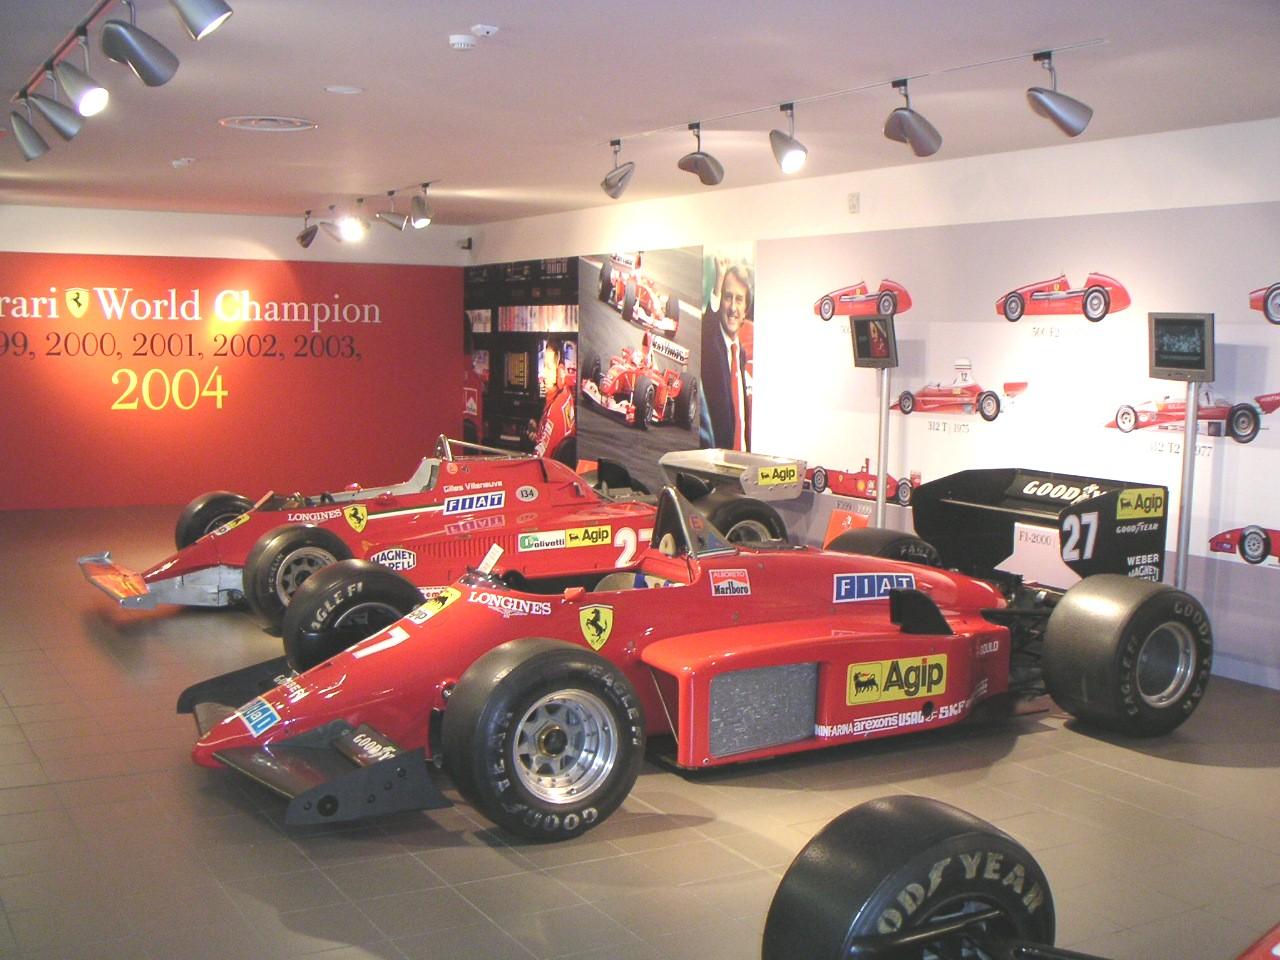 Formel 1 - Ferrari Museum in Maranello